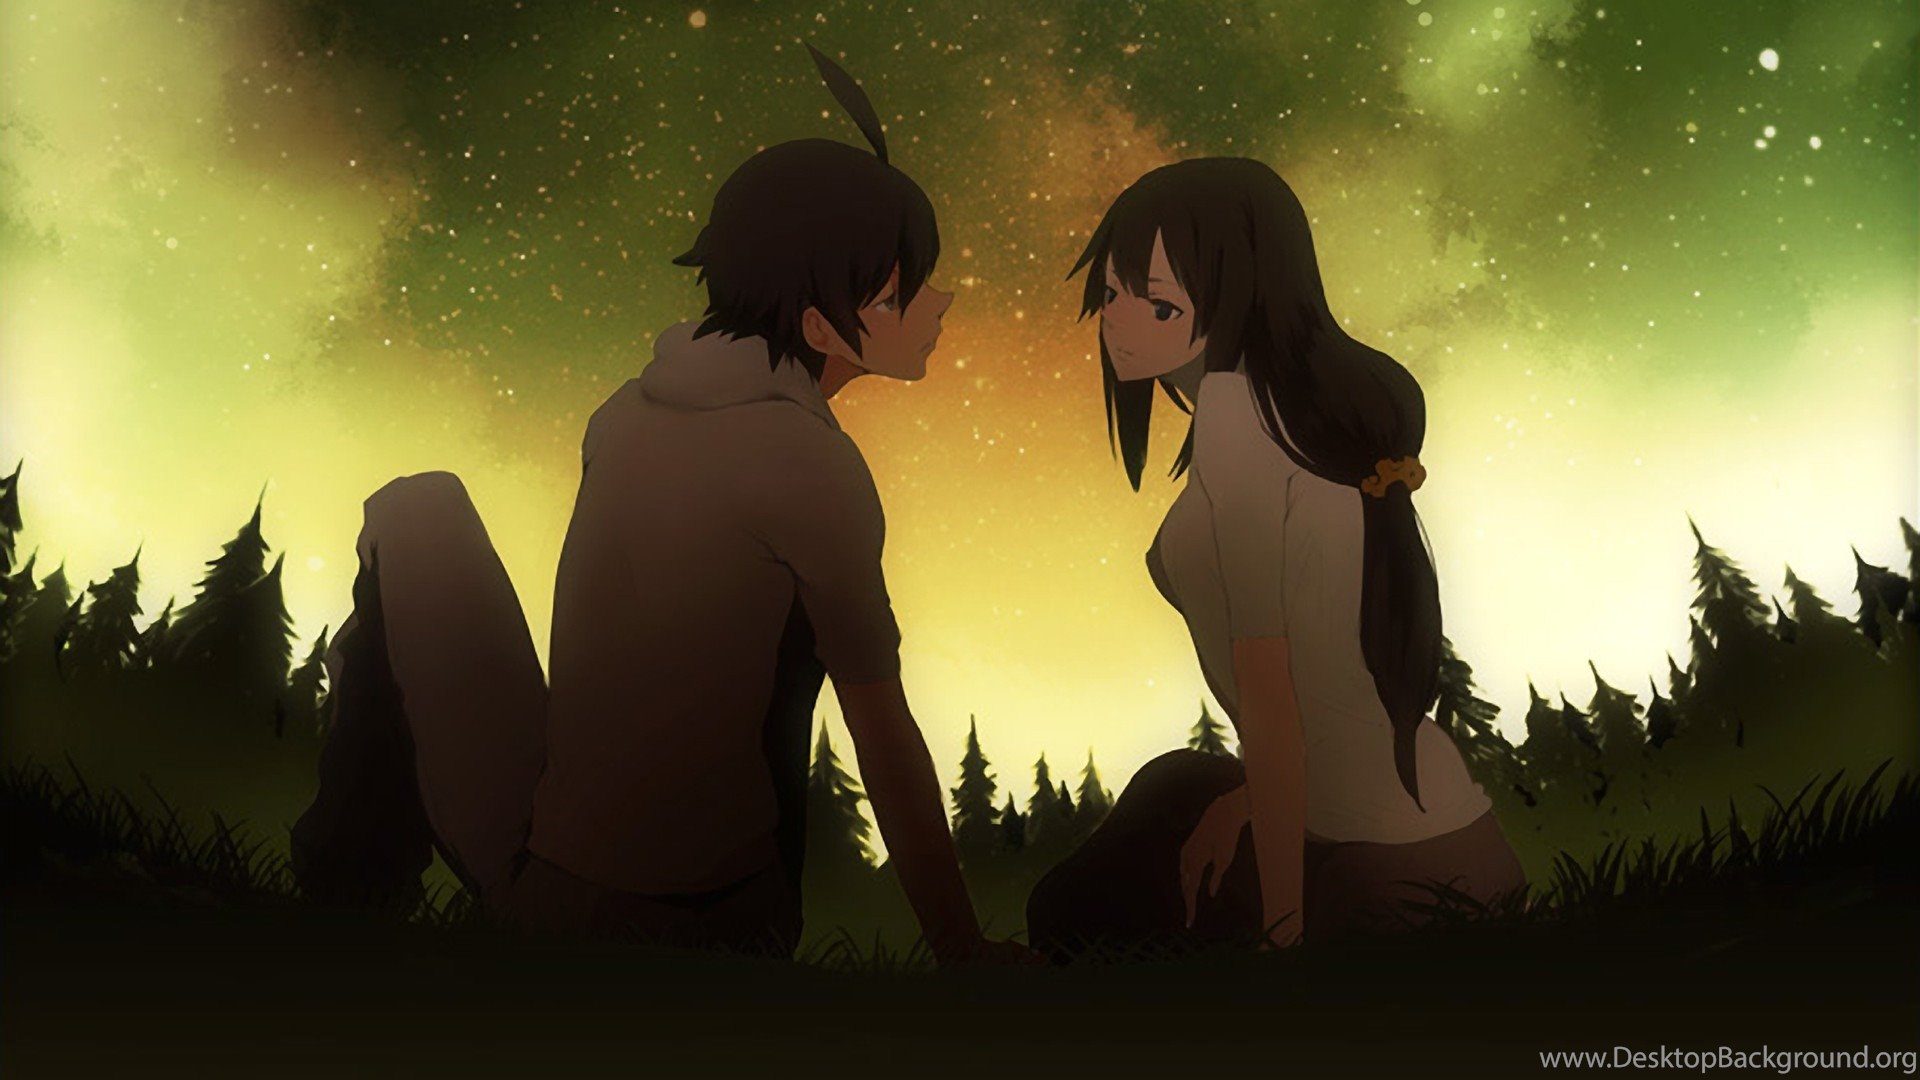 Anime Couple Wallpaper 4k - Anime Wallpaper HD